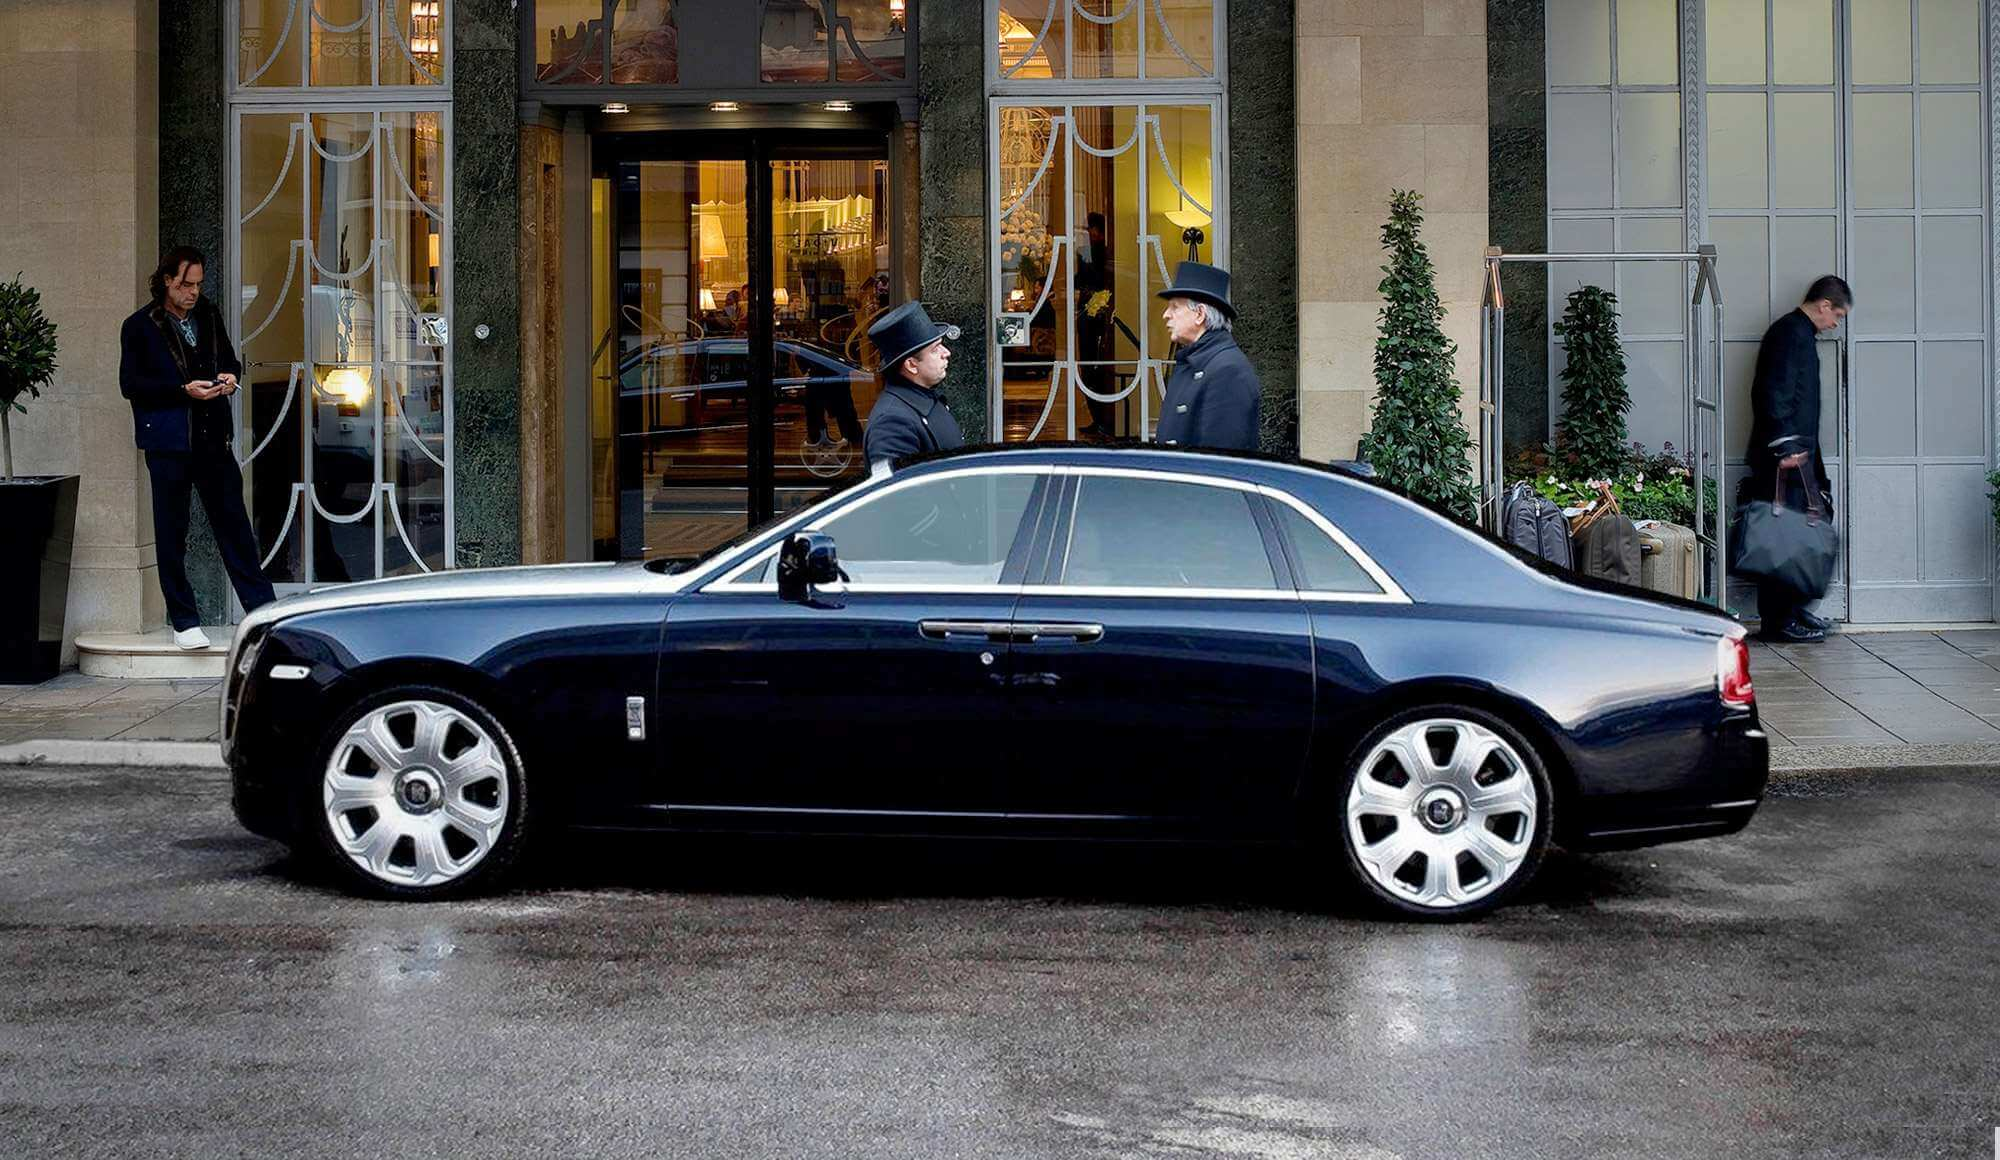 Rolls Royce Ghost - Chauffeured Luxury Vehicle